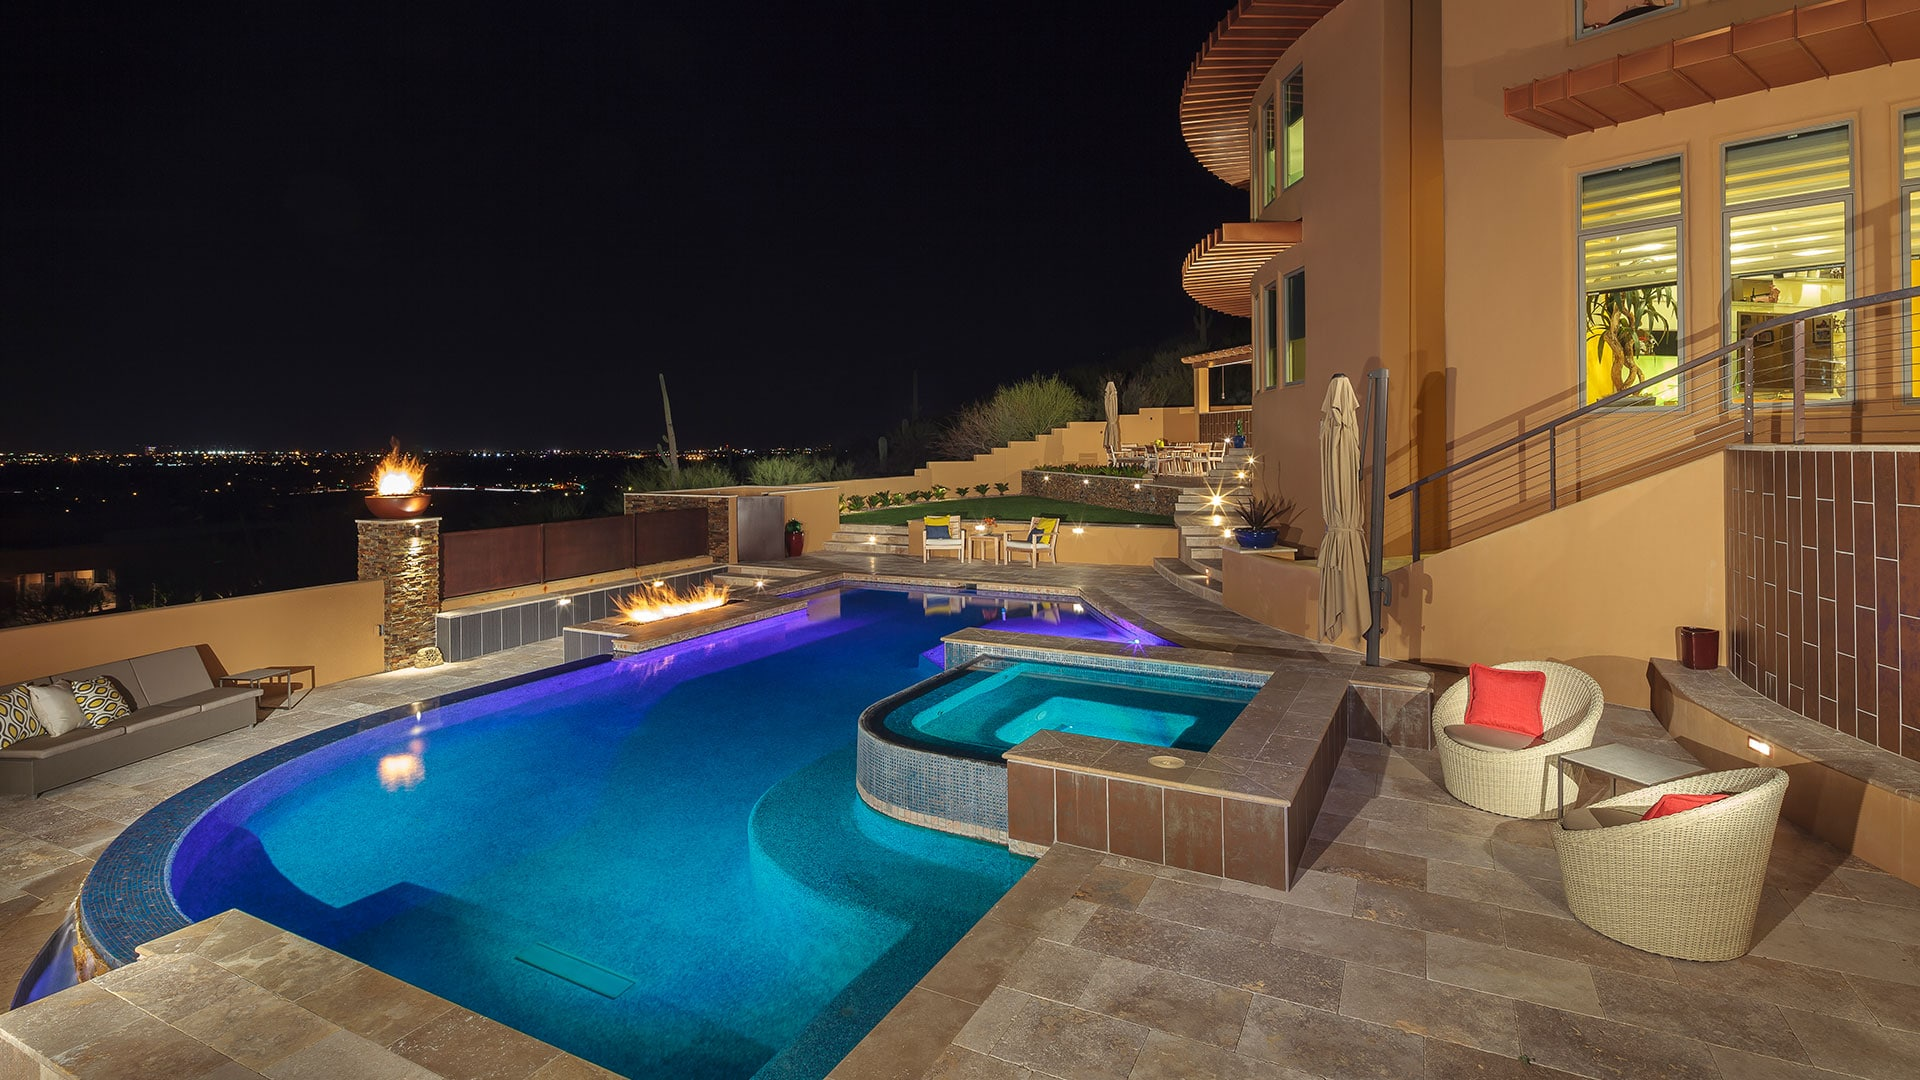 A modern Arizona home with a gorgeous backyard